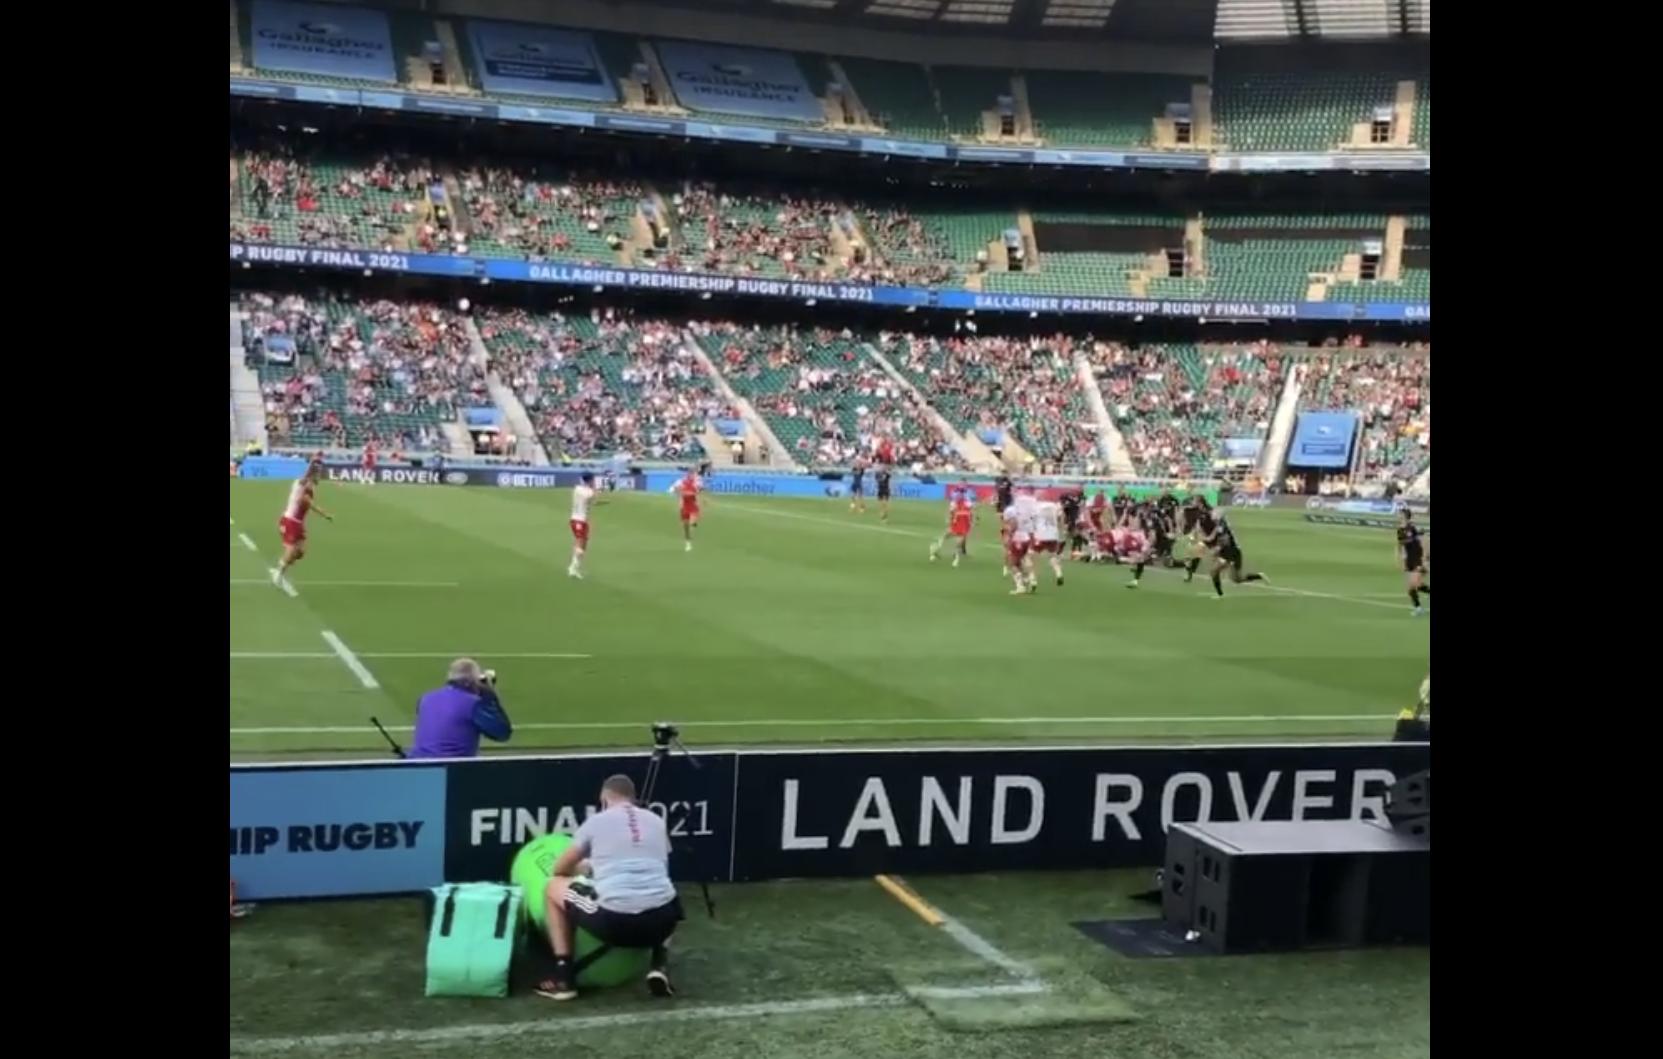 Wild scenes of Twickenham pitch invasion after Premiership win